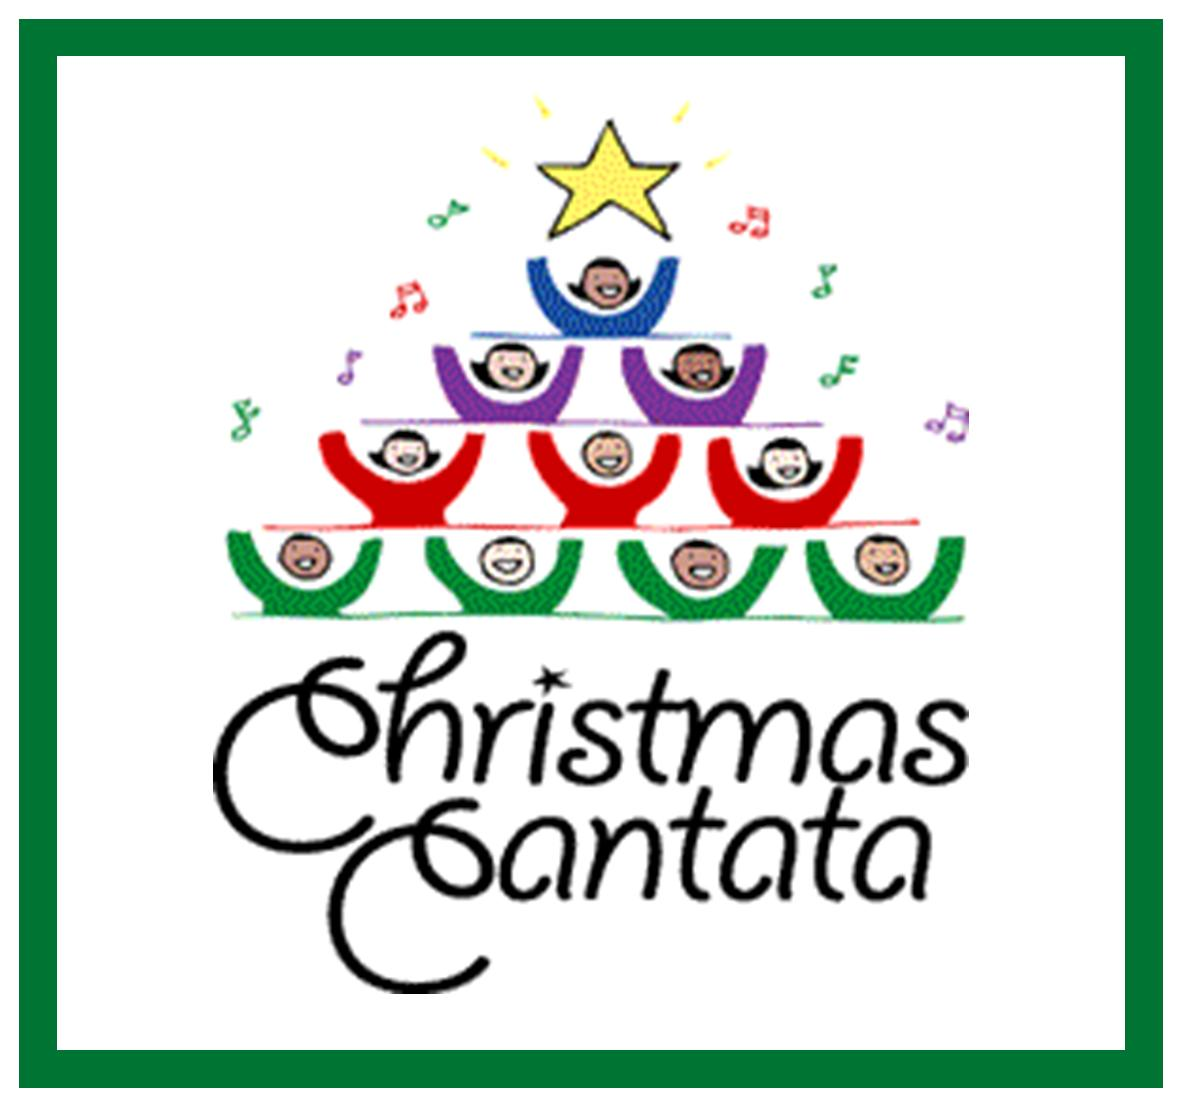 1182x1107 Christmas Cantata 2013 Park Presbyterian Church